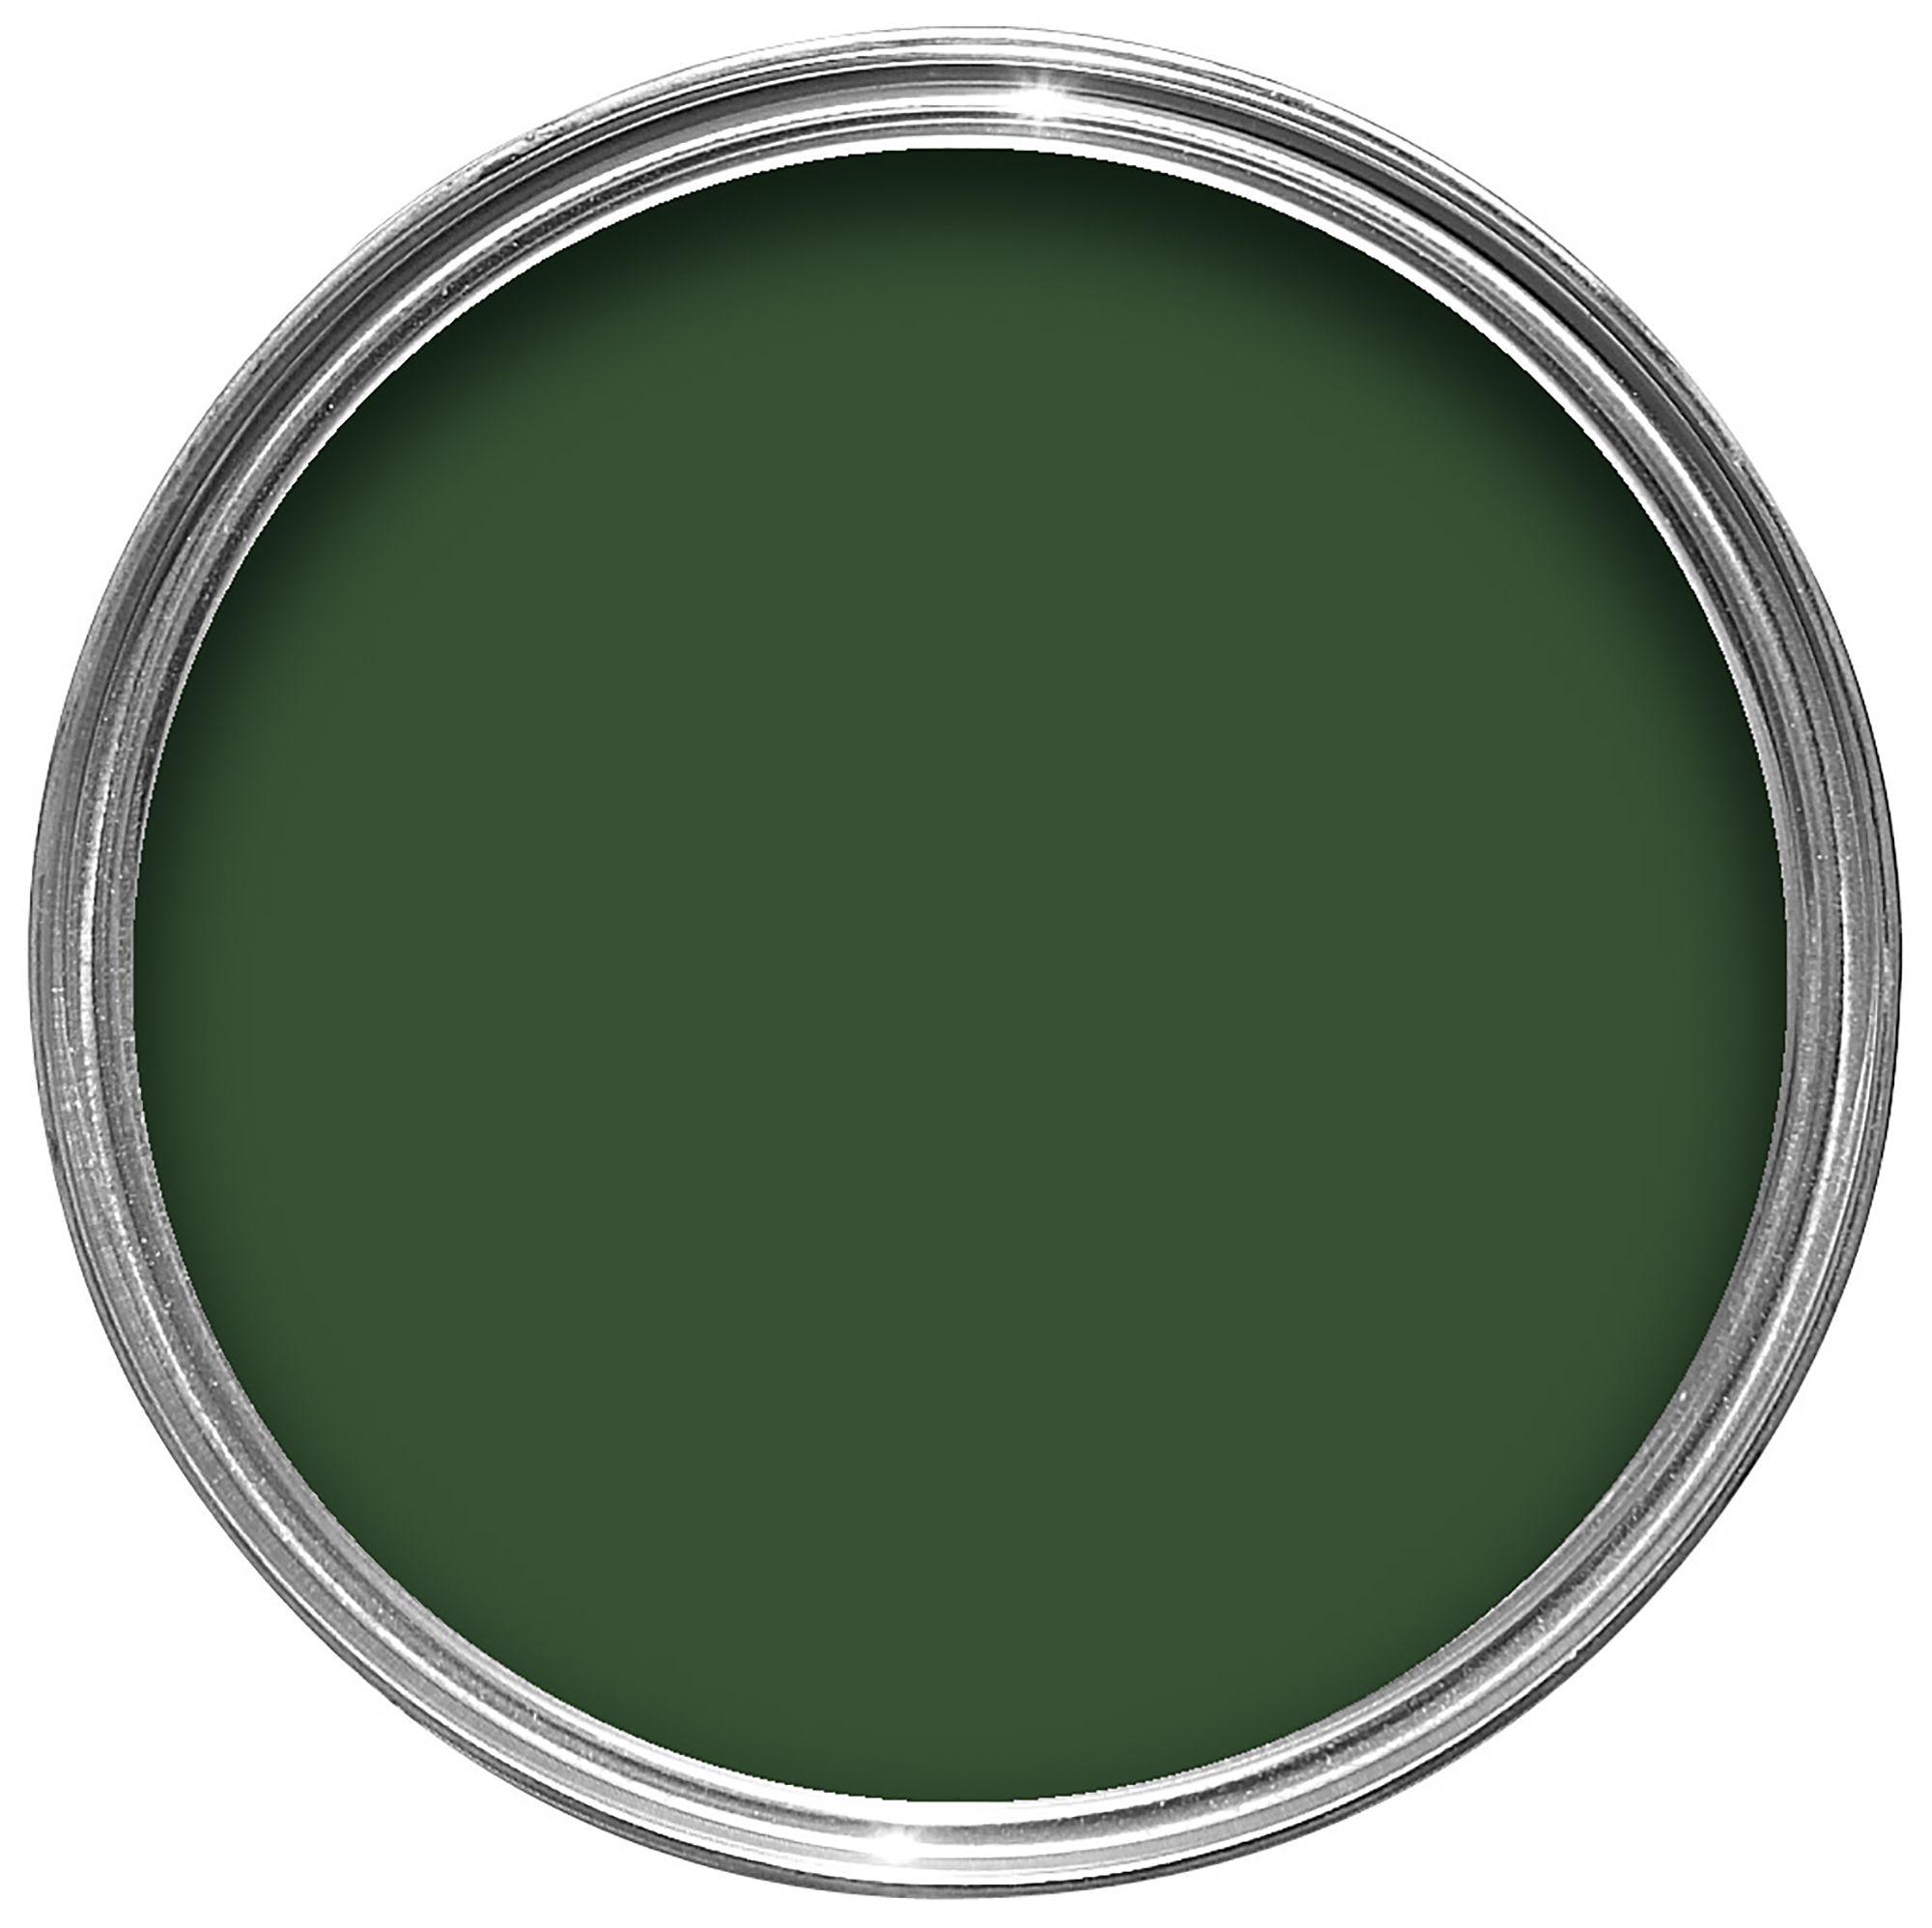 Colours Exterior Buckingham Green Gloss Wood & Metal Paint 2.5l